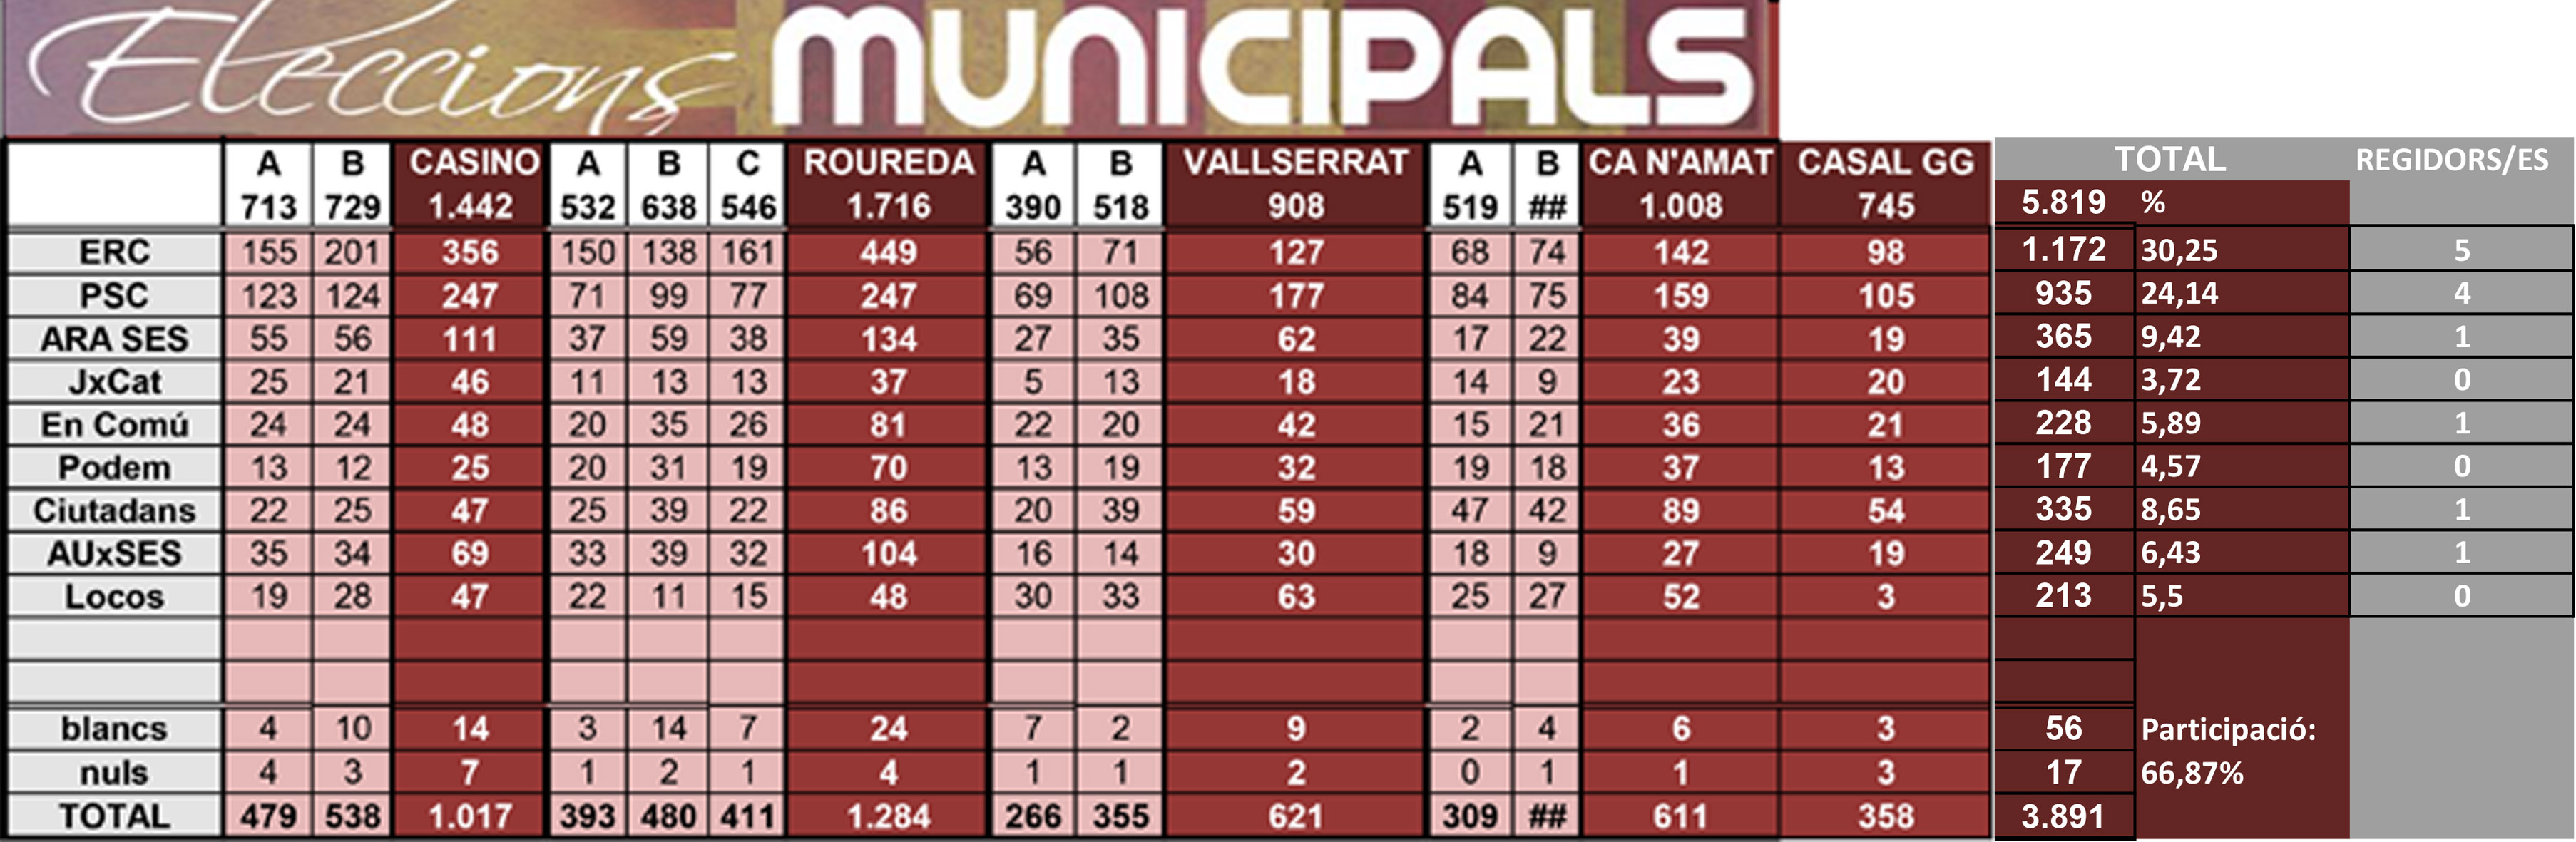 Resultats municipals 2019